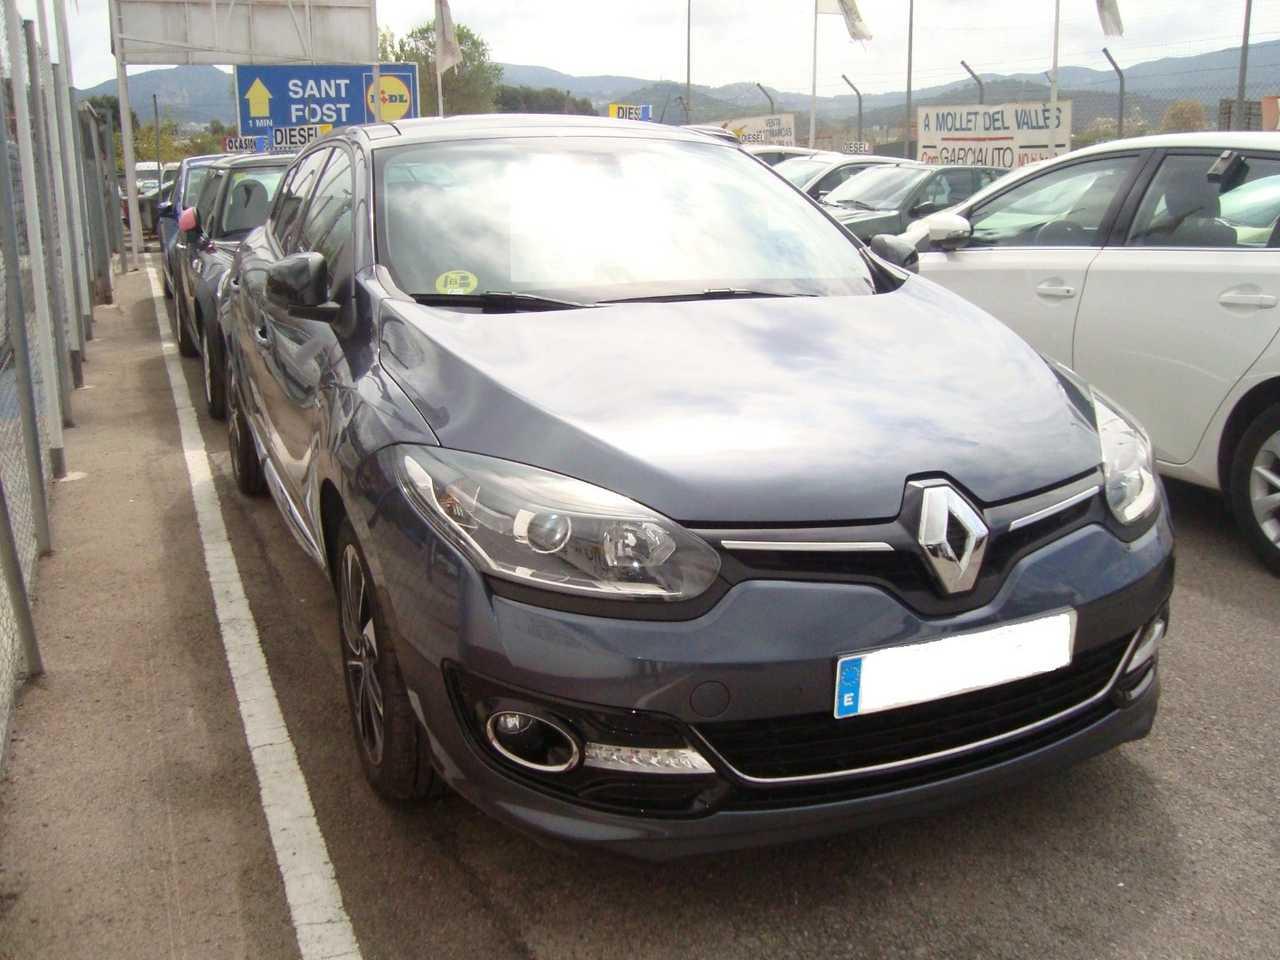 Renault Megane 1.6DCI 130 CV  ENERGY BOSE  130 CV   - Foto 1